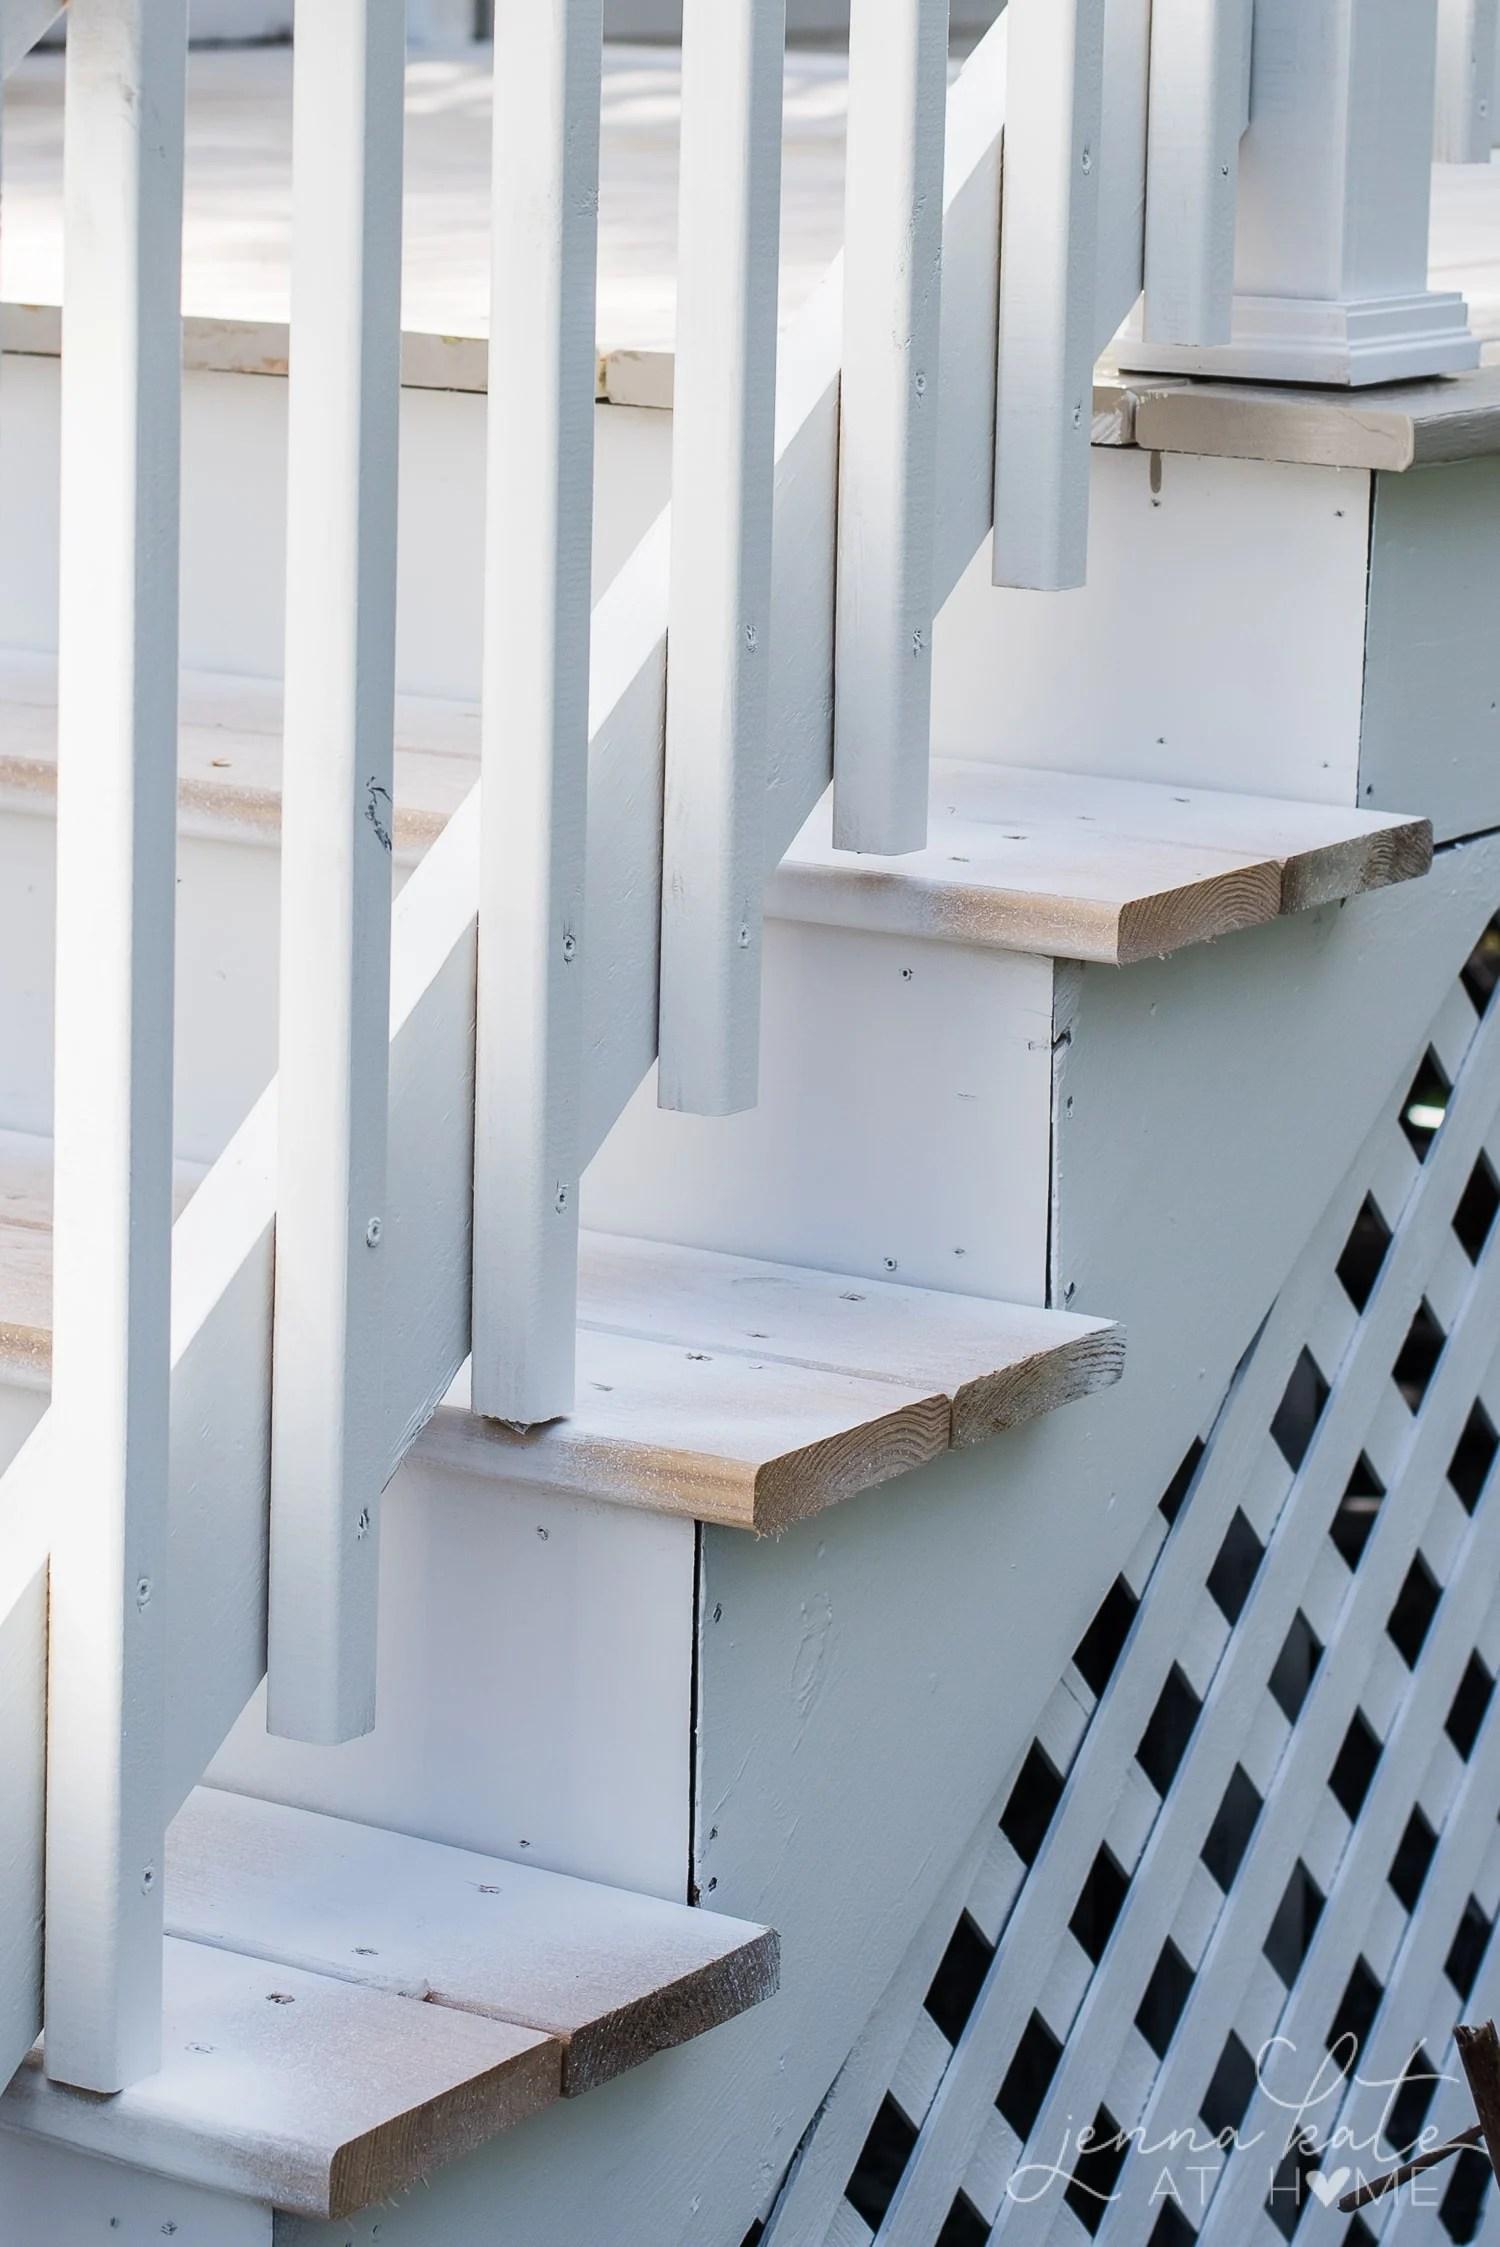 Overspray on deck spindles